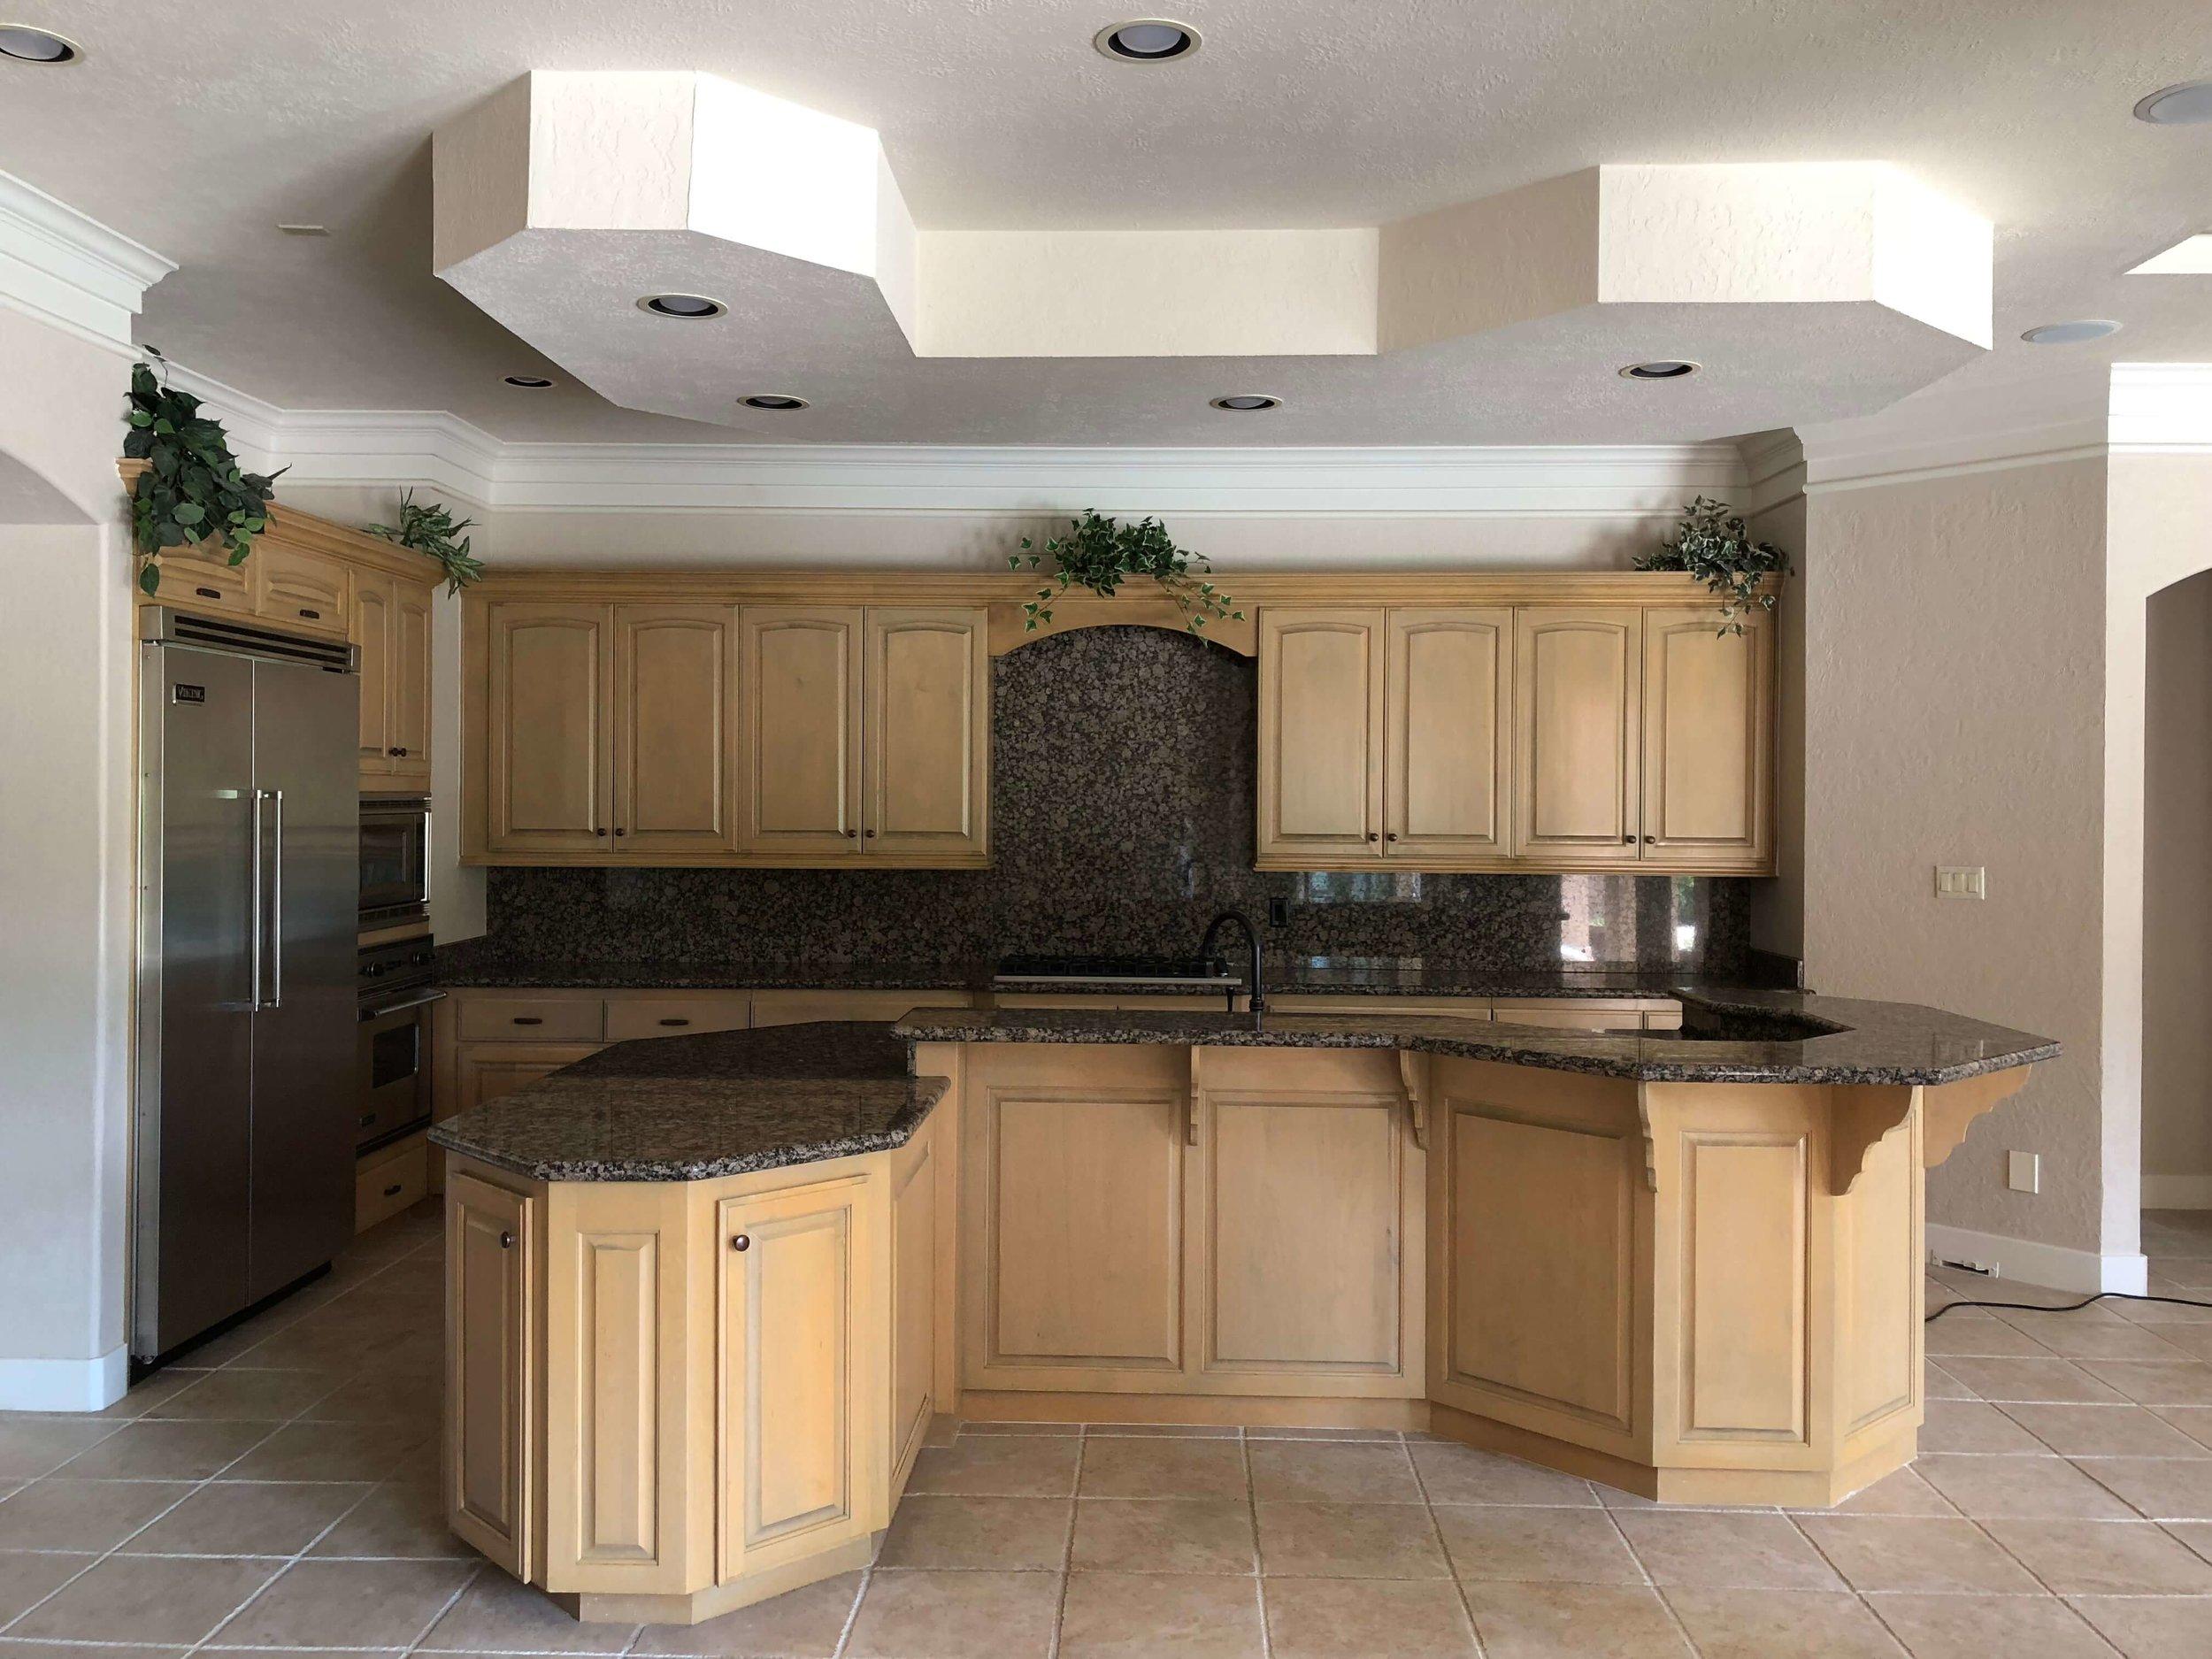 BEFORE Kitchen Remodel | #kitchenremodel #kitchenideas #kitchenremodelideas